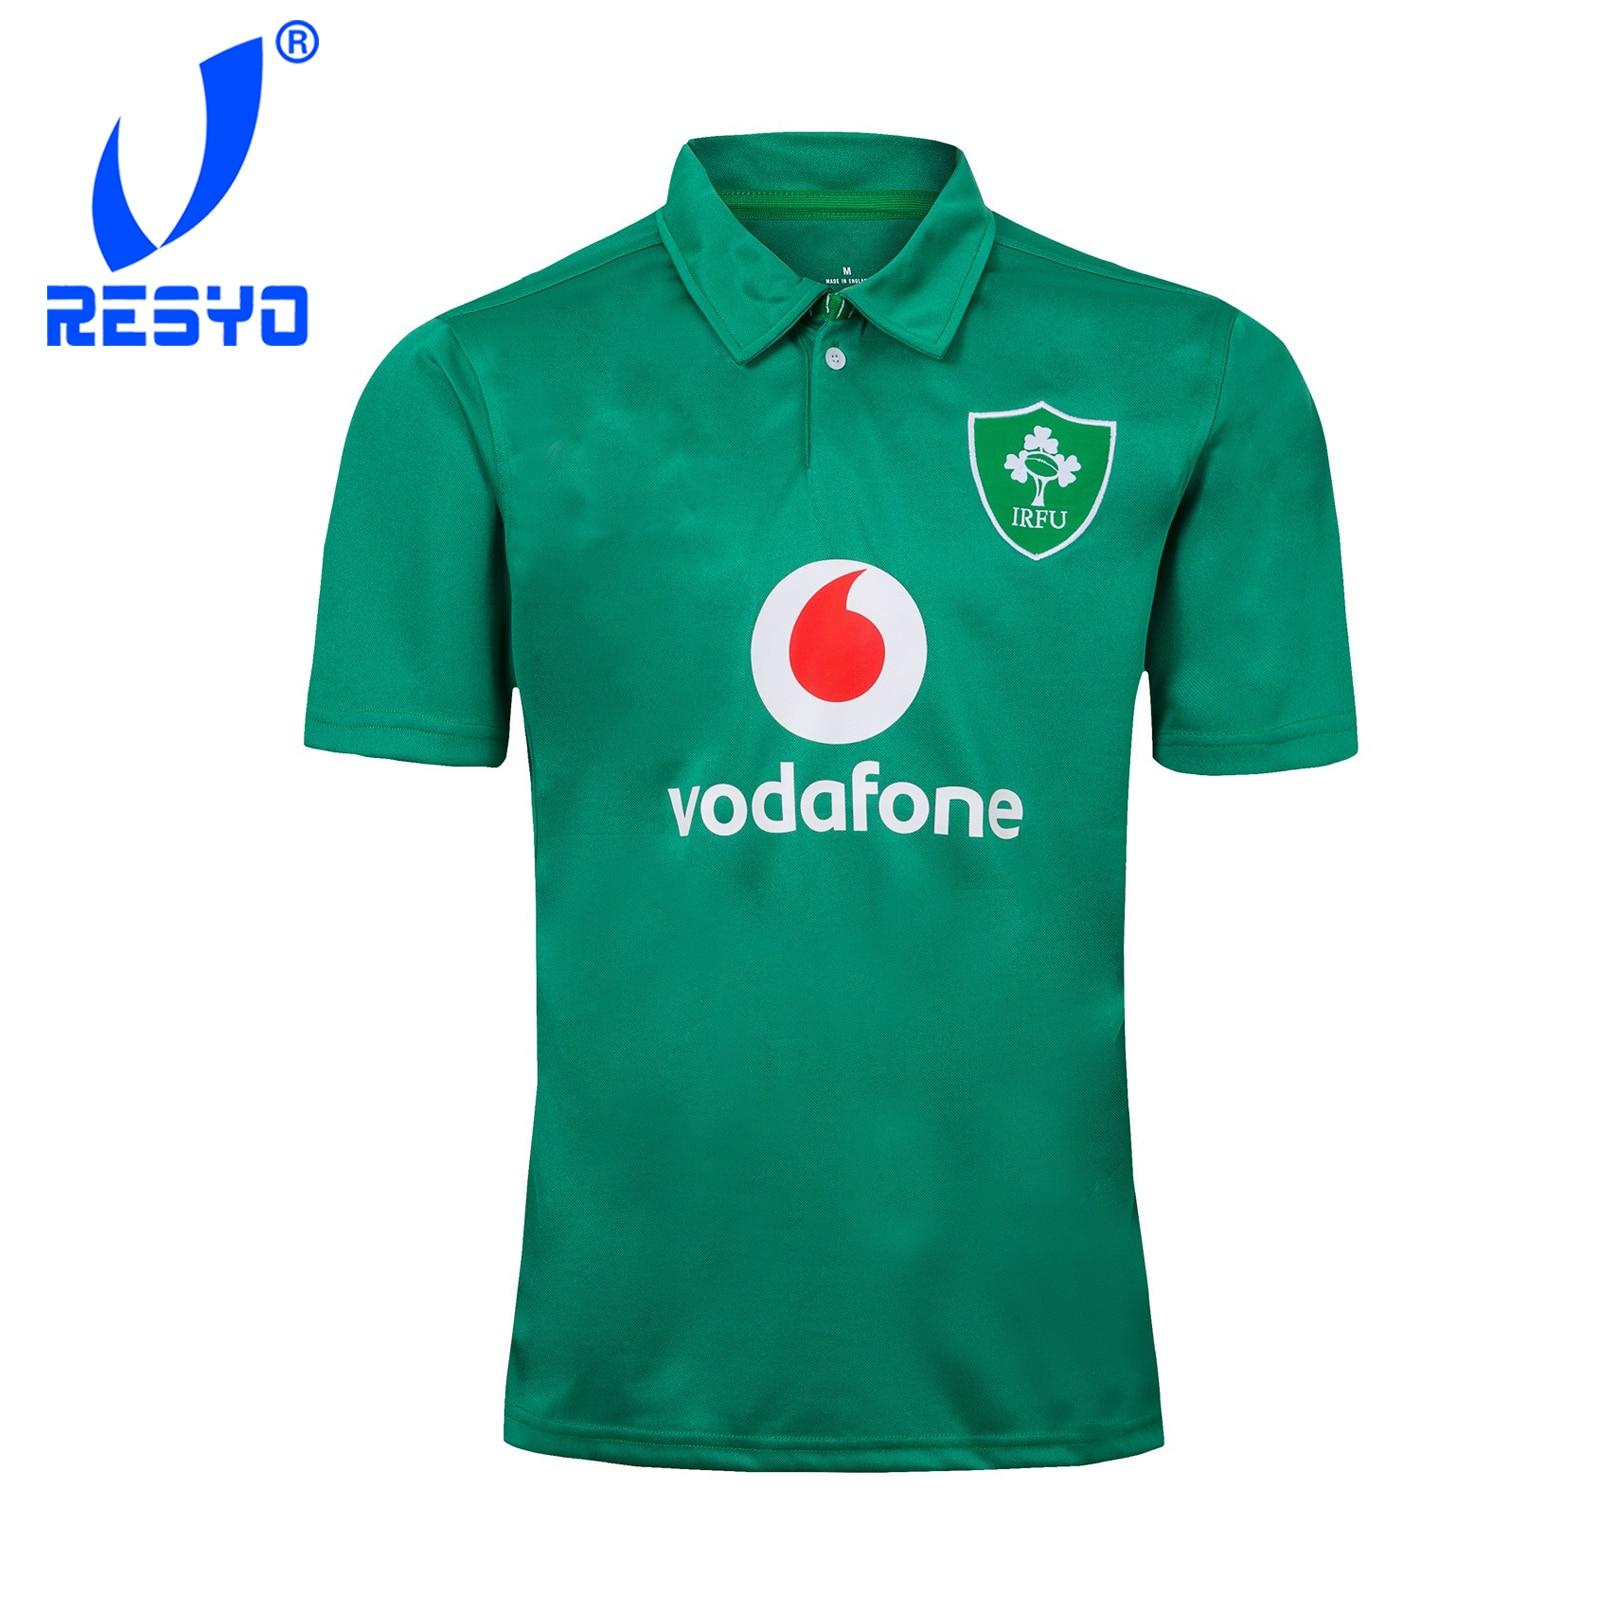 Resyo para 2019 irland polos camisa de rugby camisa esportiva masculina S-3XL